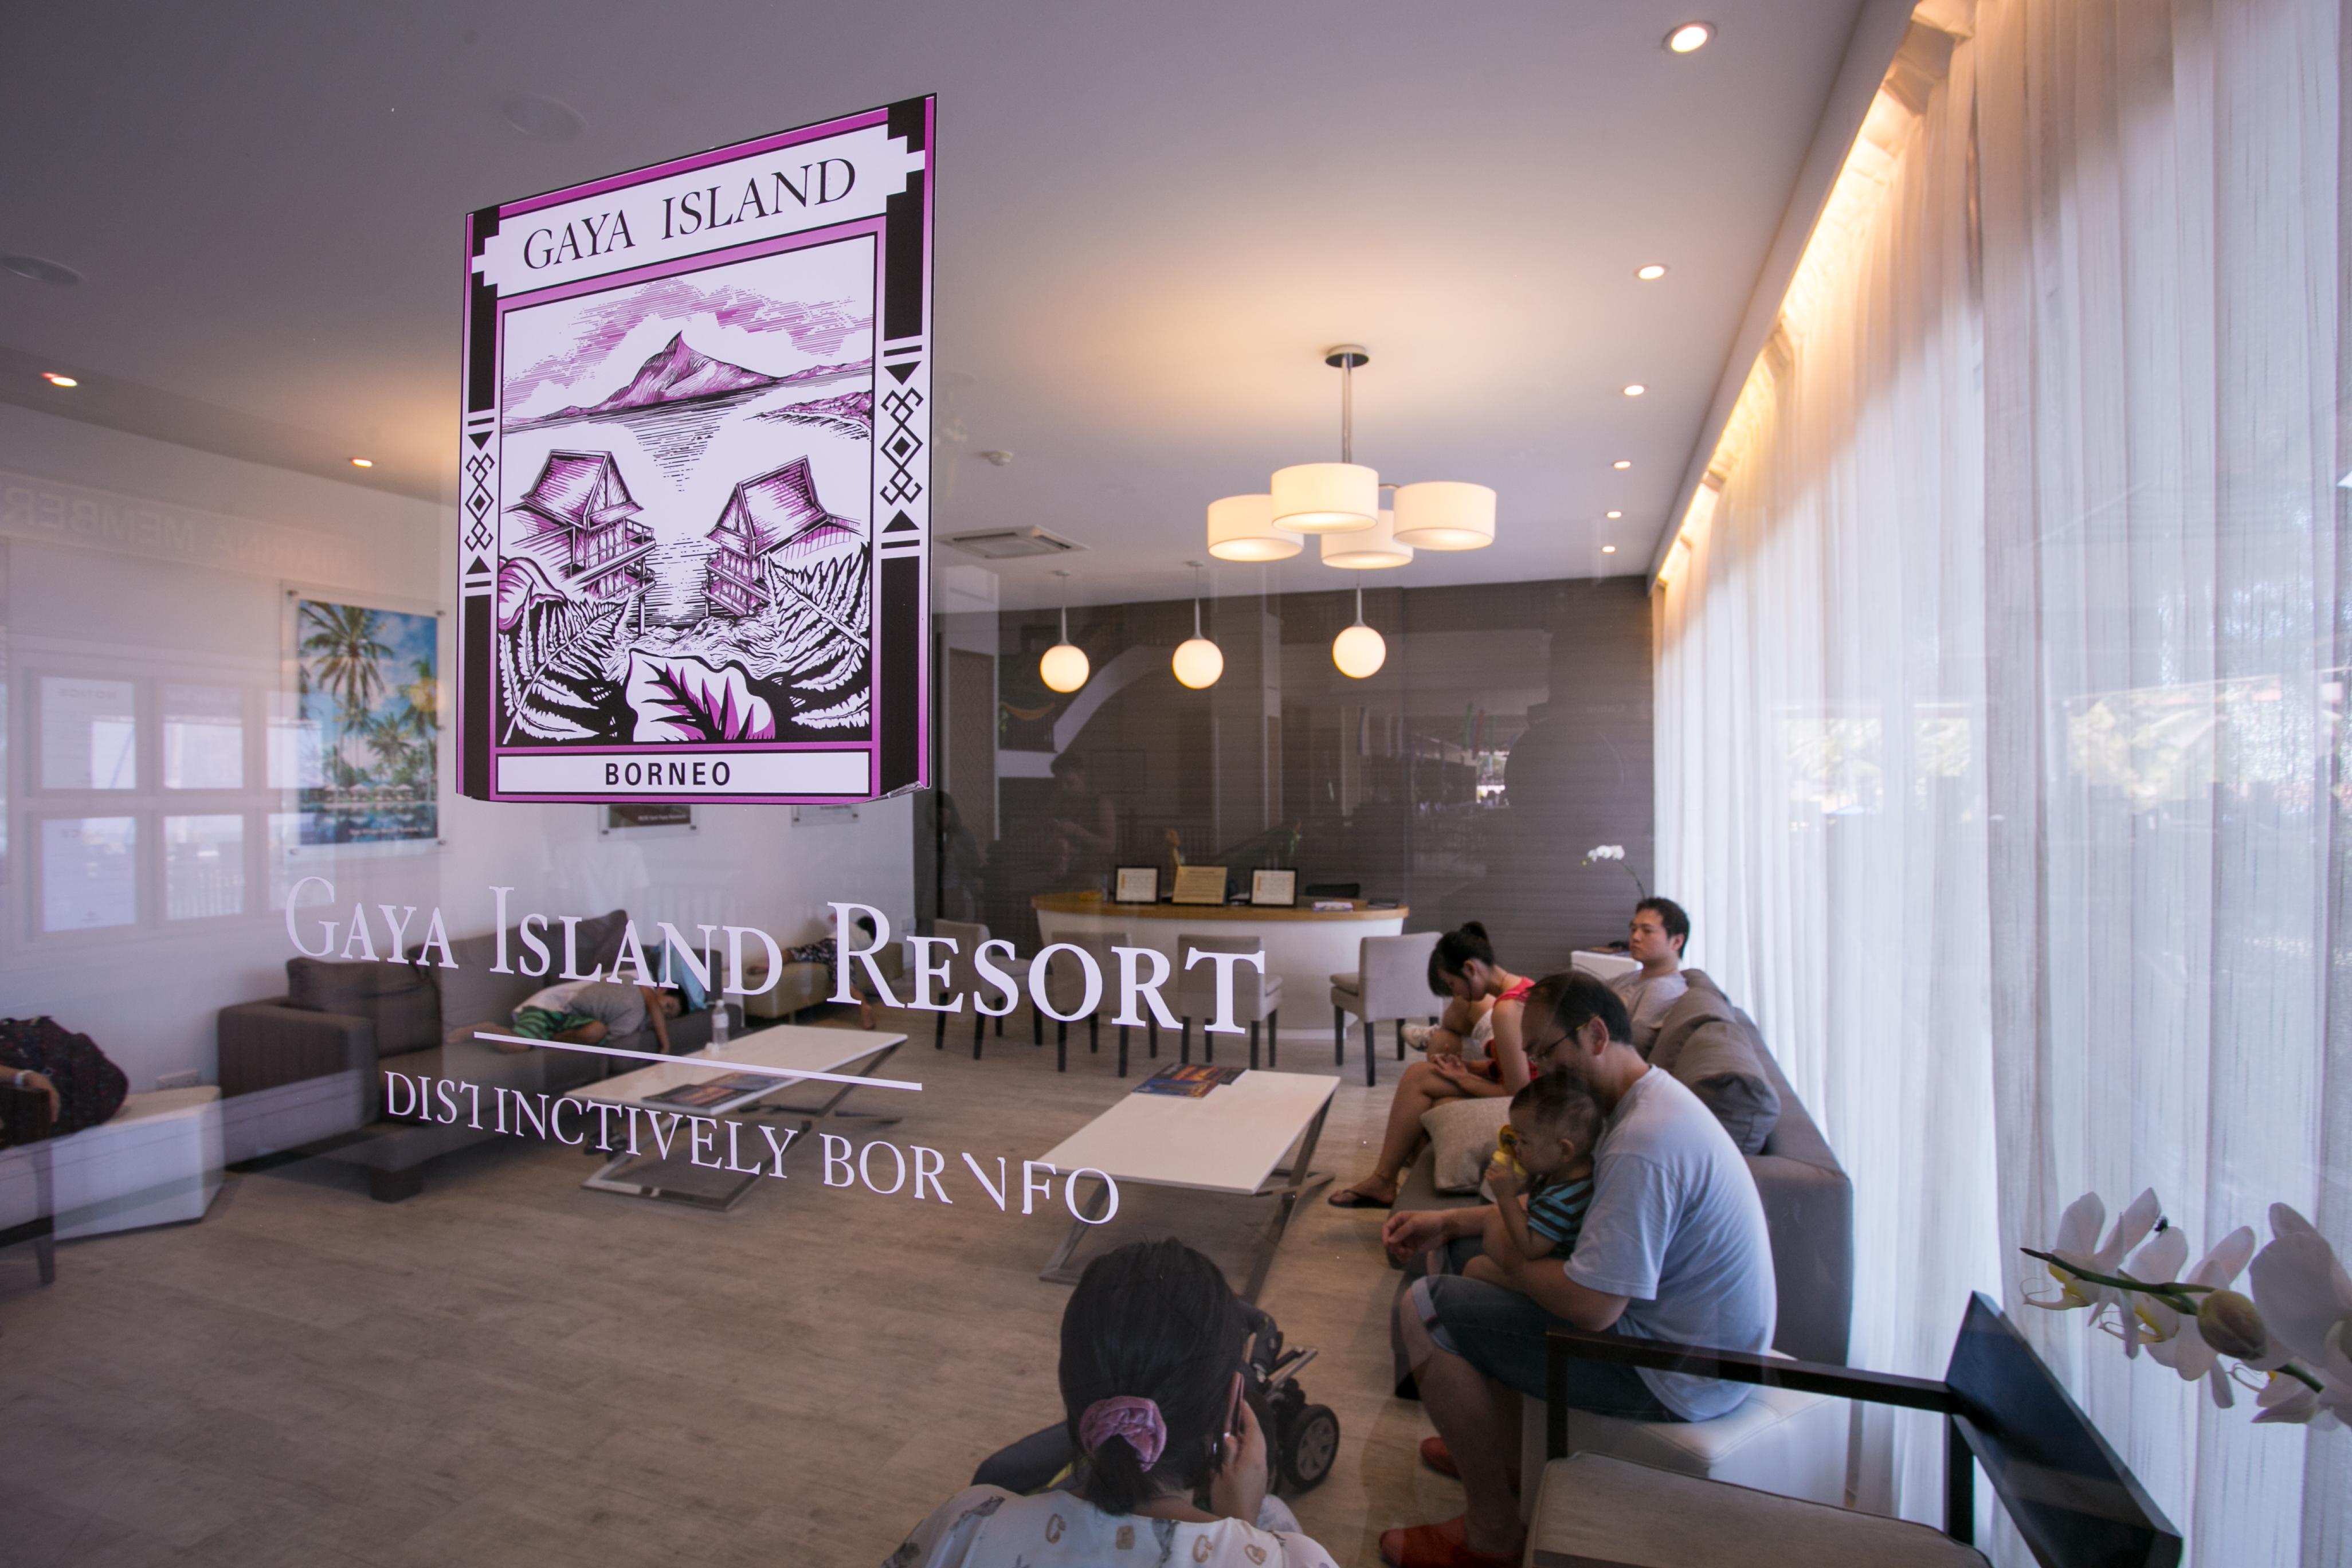 Gaya Island Resort加雅島的商業拍攝31